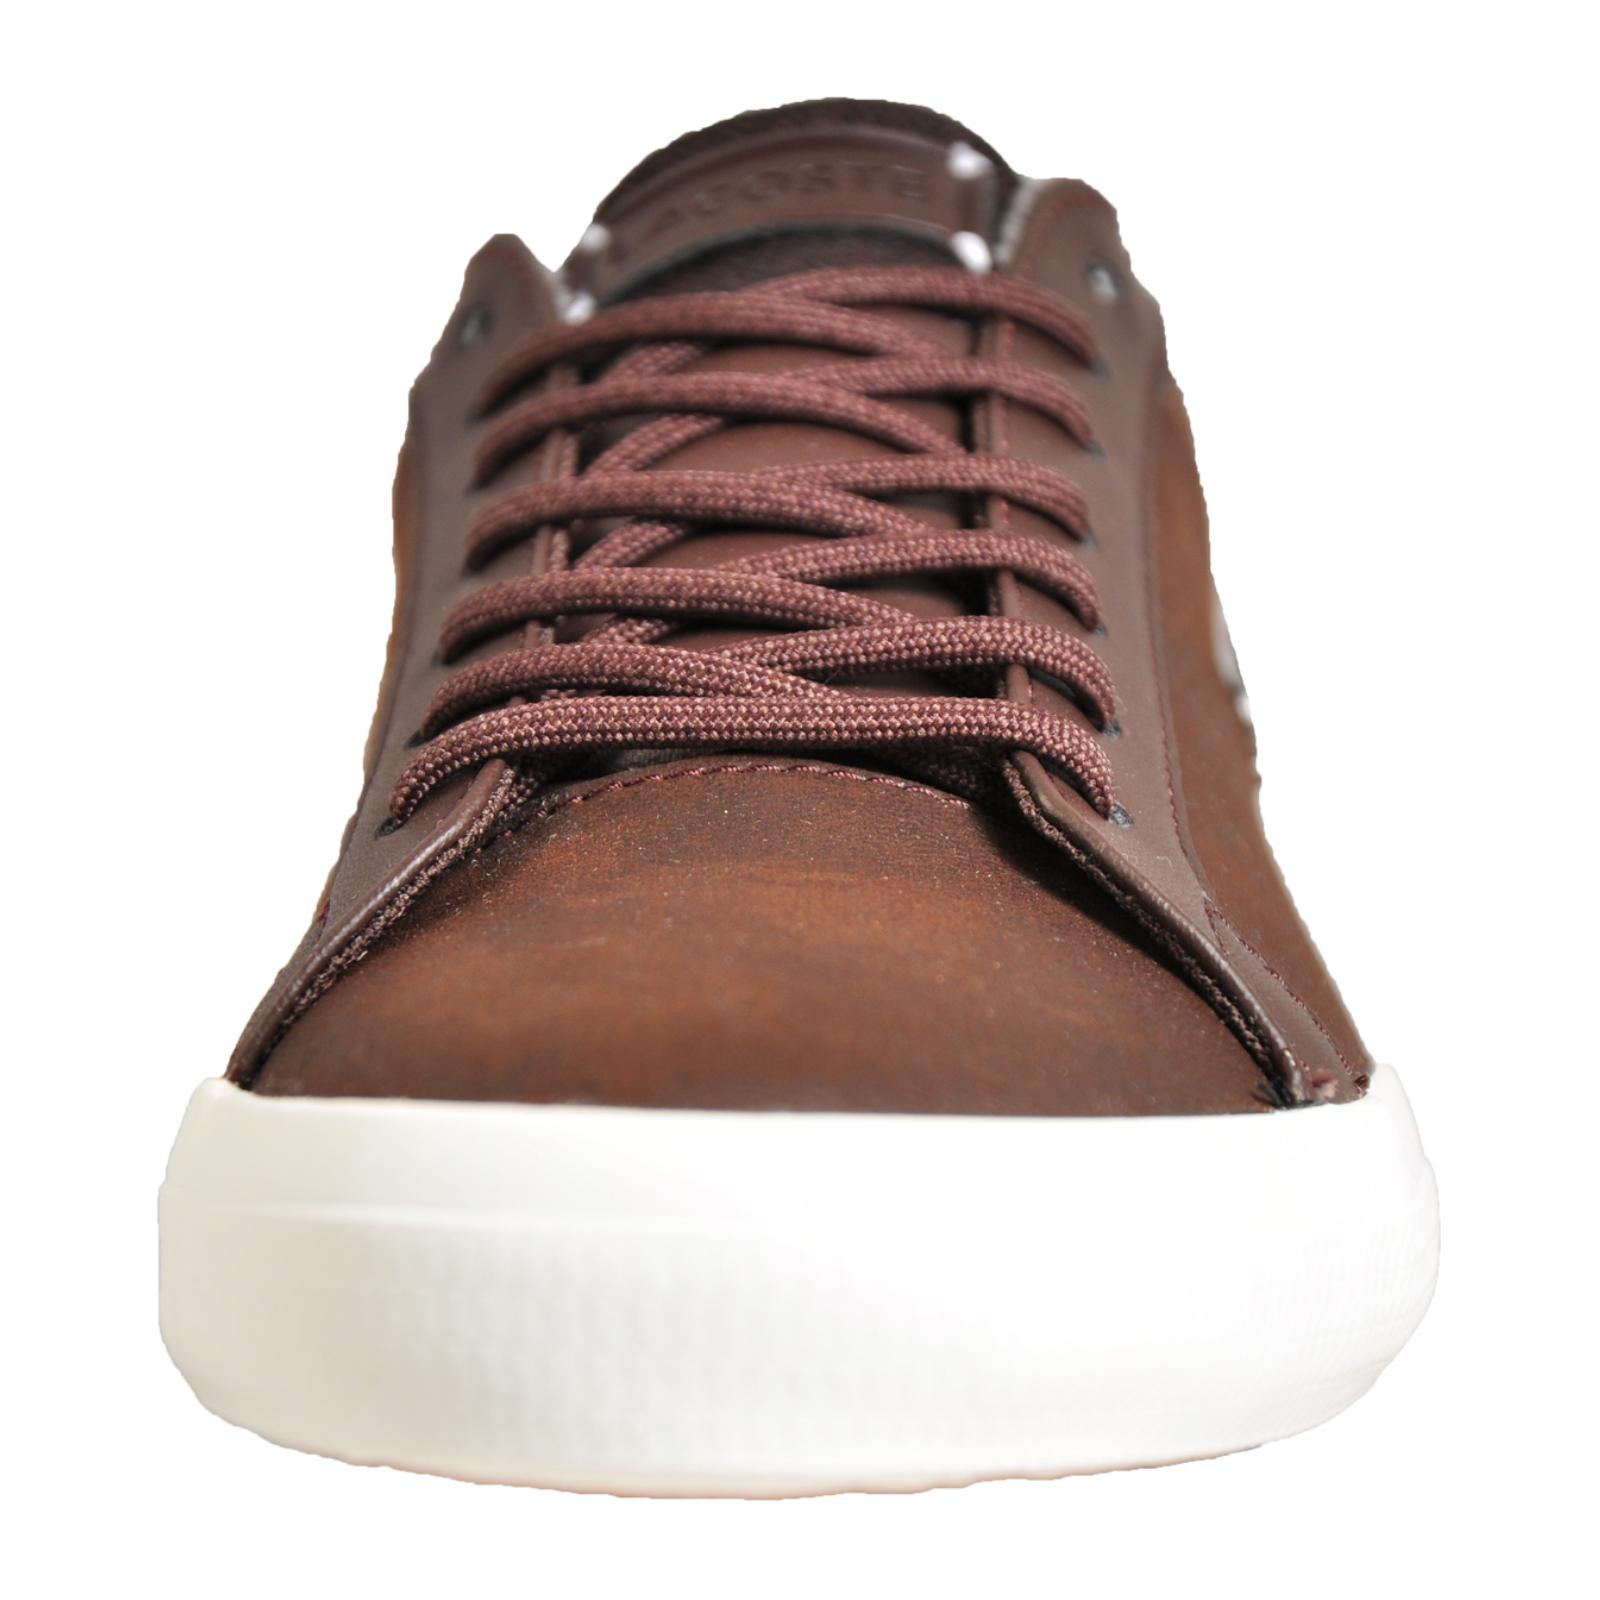 5ee4bc9fc Lacoste Lerond 318 Men s Leather Classic Casual Retro Designer Trainers  Brown B Grade